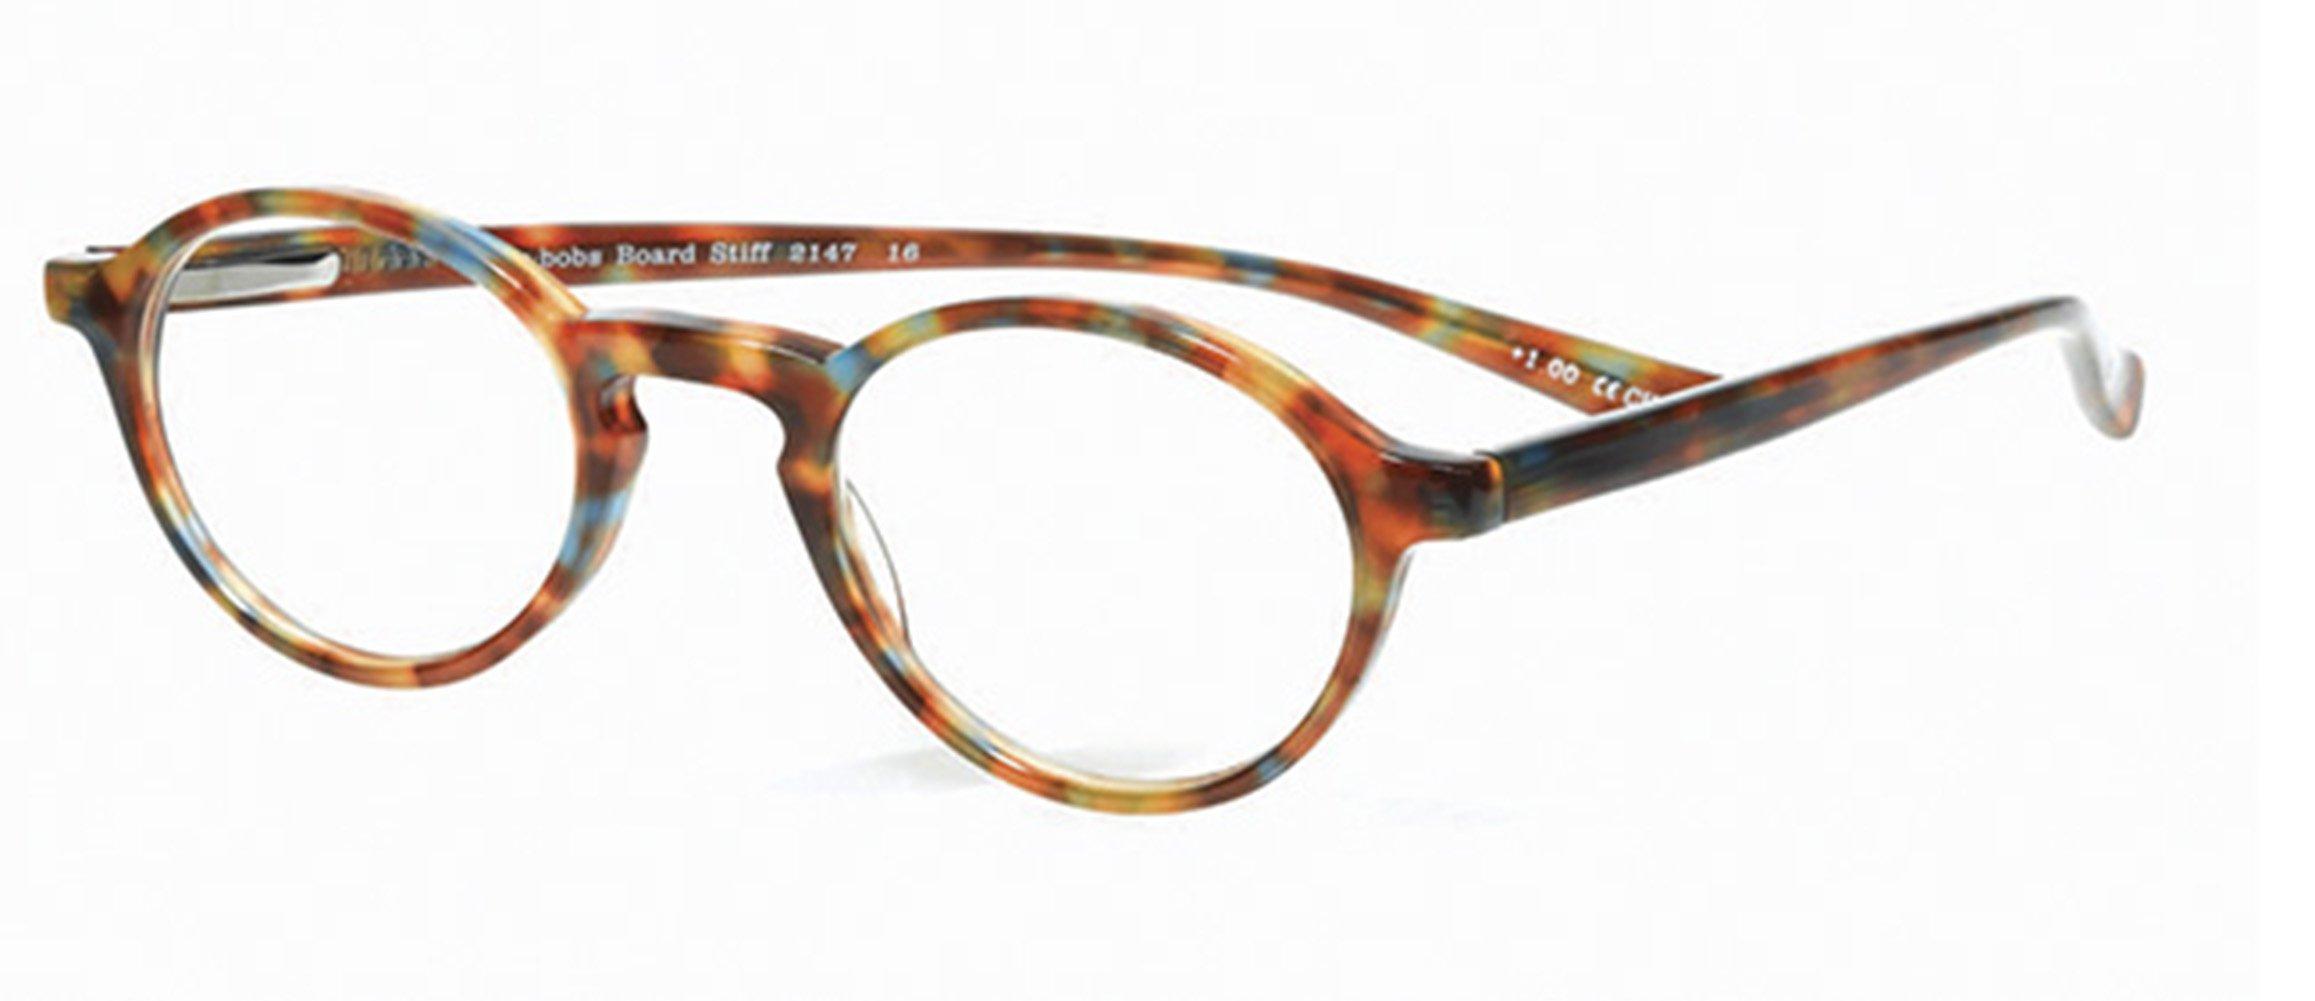 Orvis Board Stiff Reading Glasses, Magnification: 2.50X